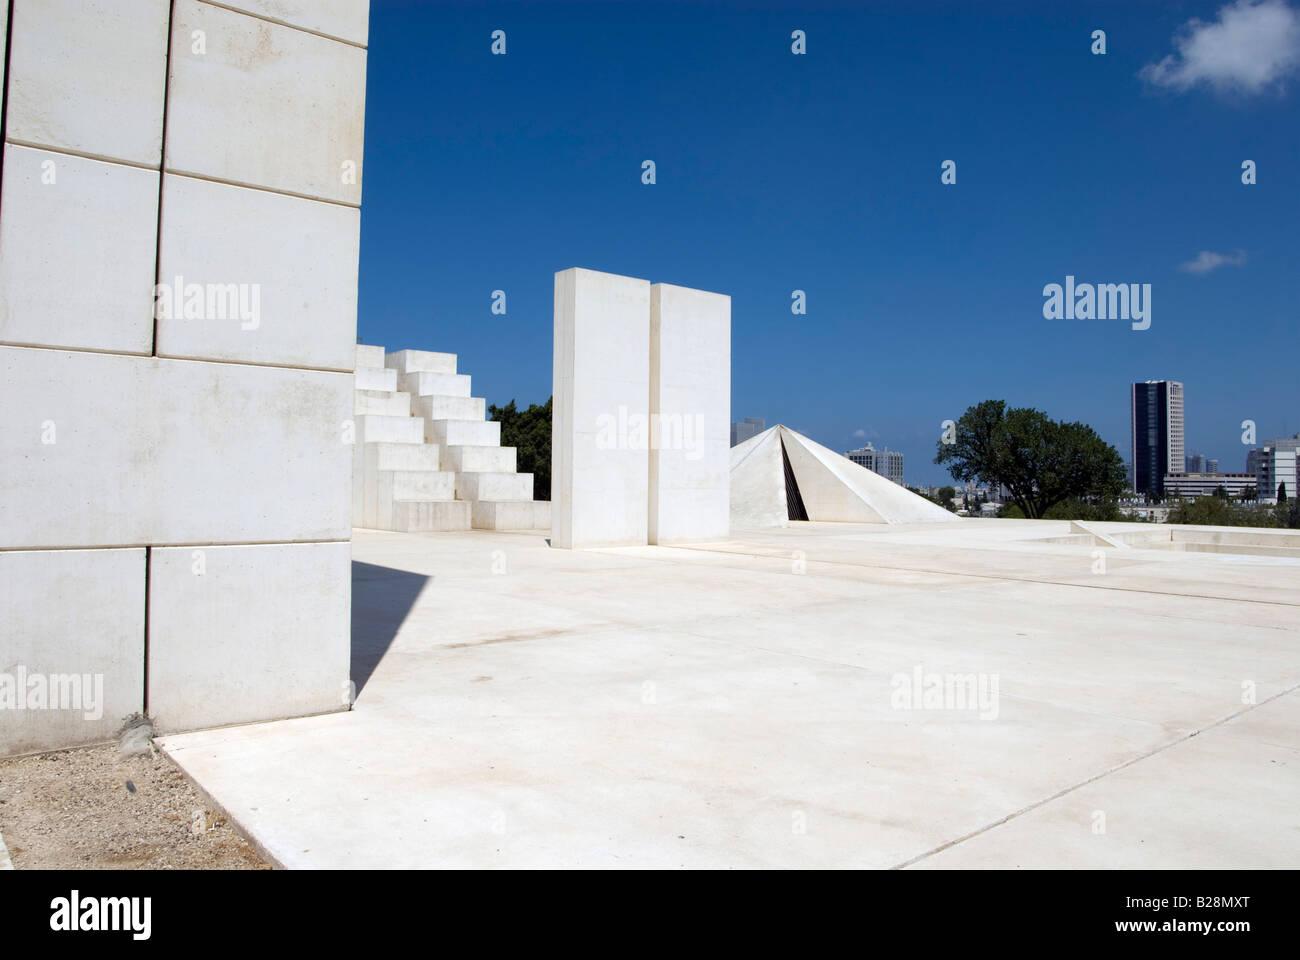 Israel Tel Aviv Wolfson Park White City Statue 1977 1988 a sculpture by Dani Karavan - Stock Image